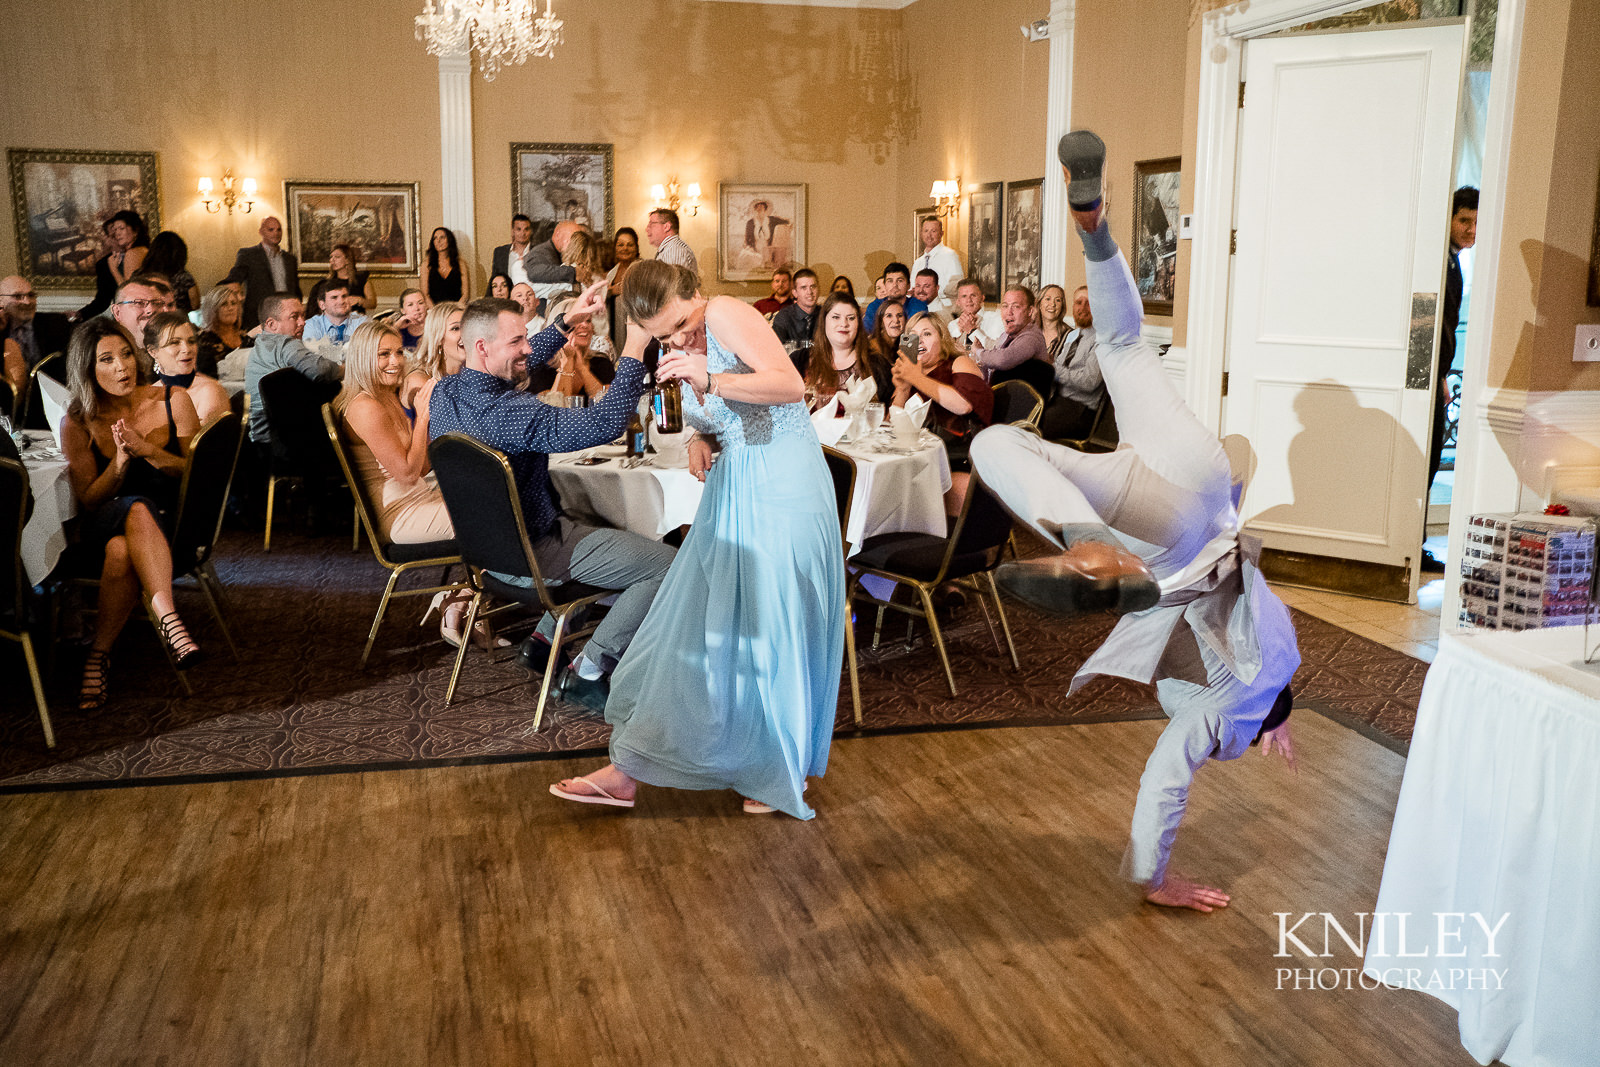 091 - Buffalo NY wedding pictures - Sean Patrick Restaurant Wedding Reception - Getzville - XT2B9358.jpg